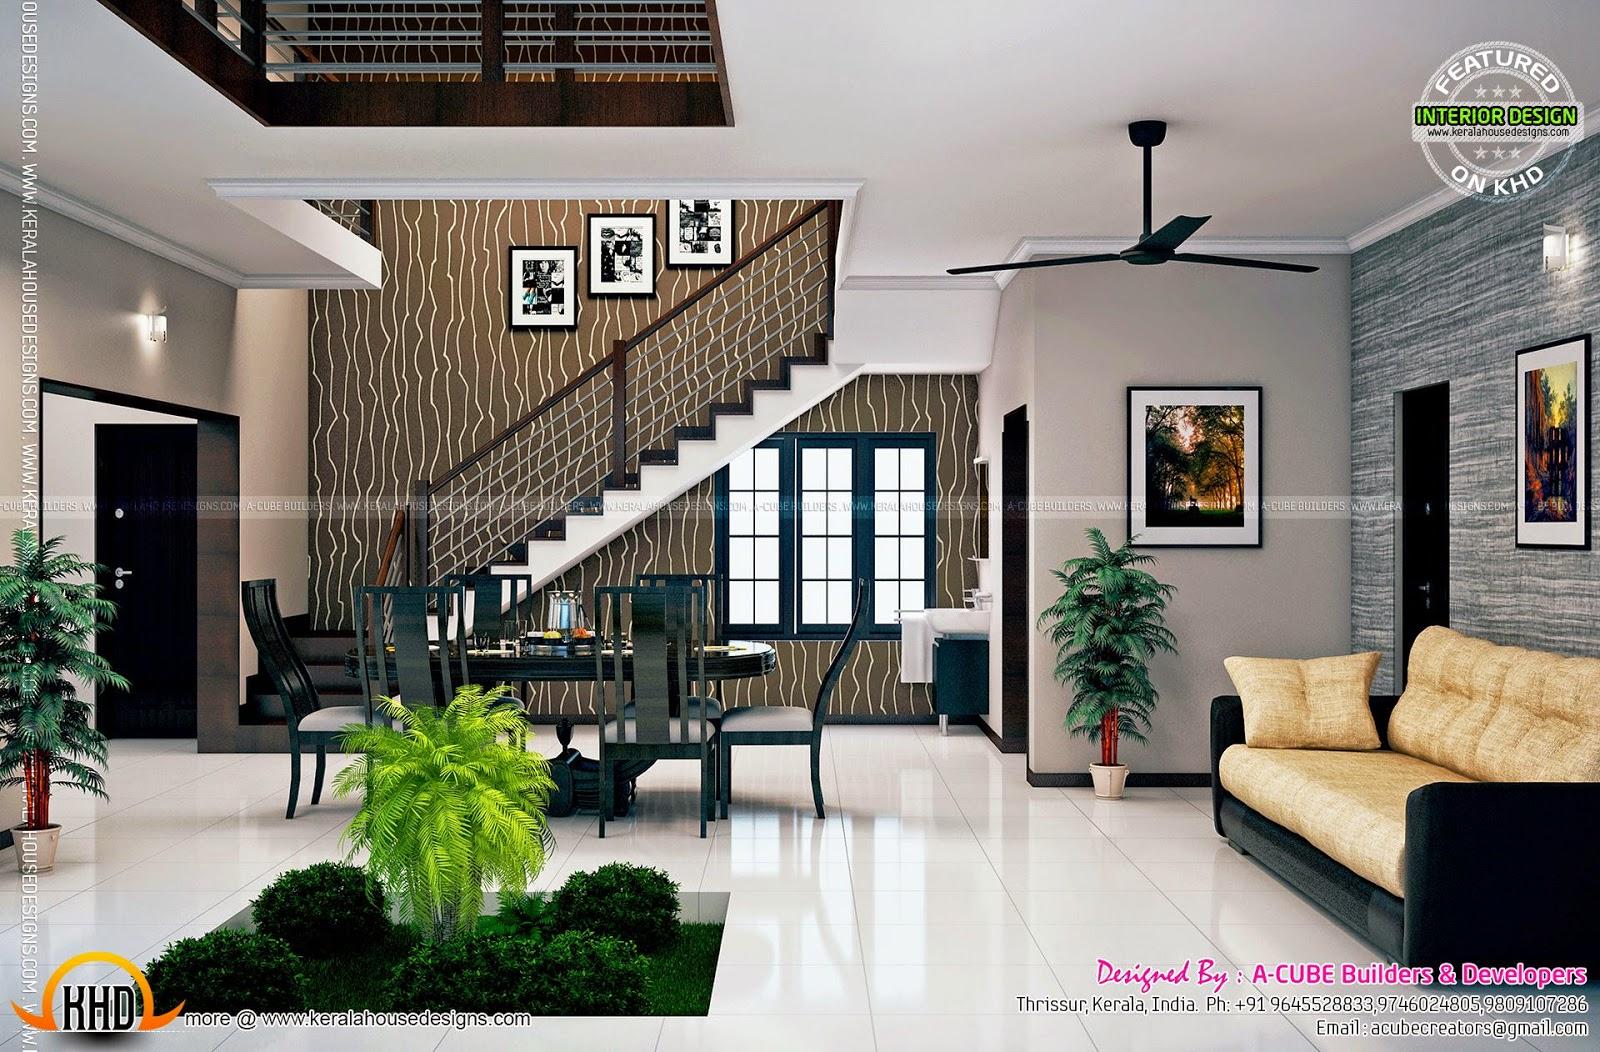 Kerala Interior Design Ideas Kerala Home Design Bloglovin'